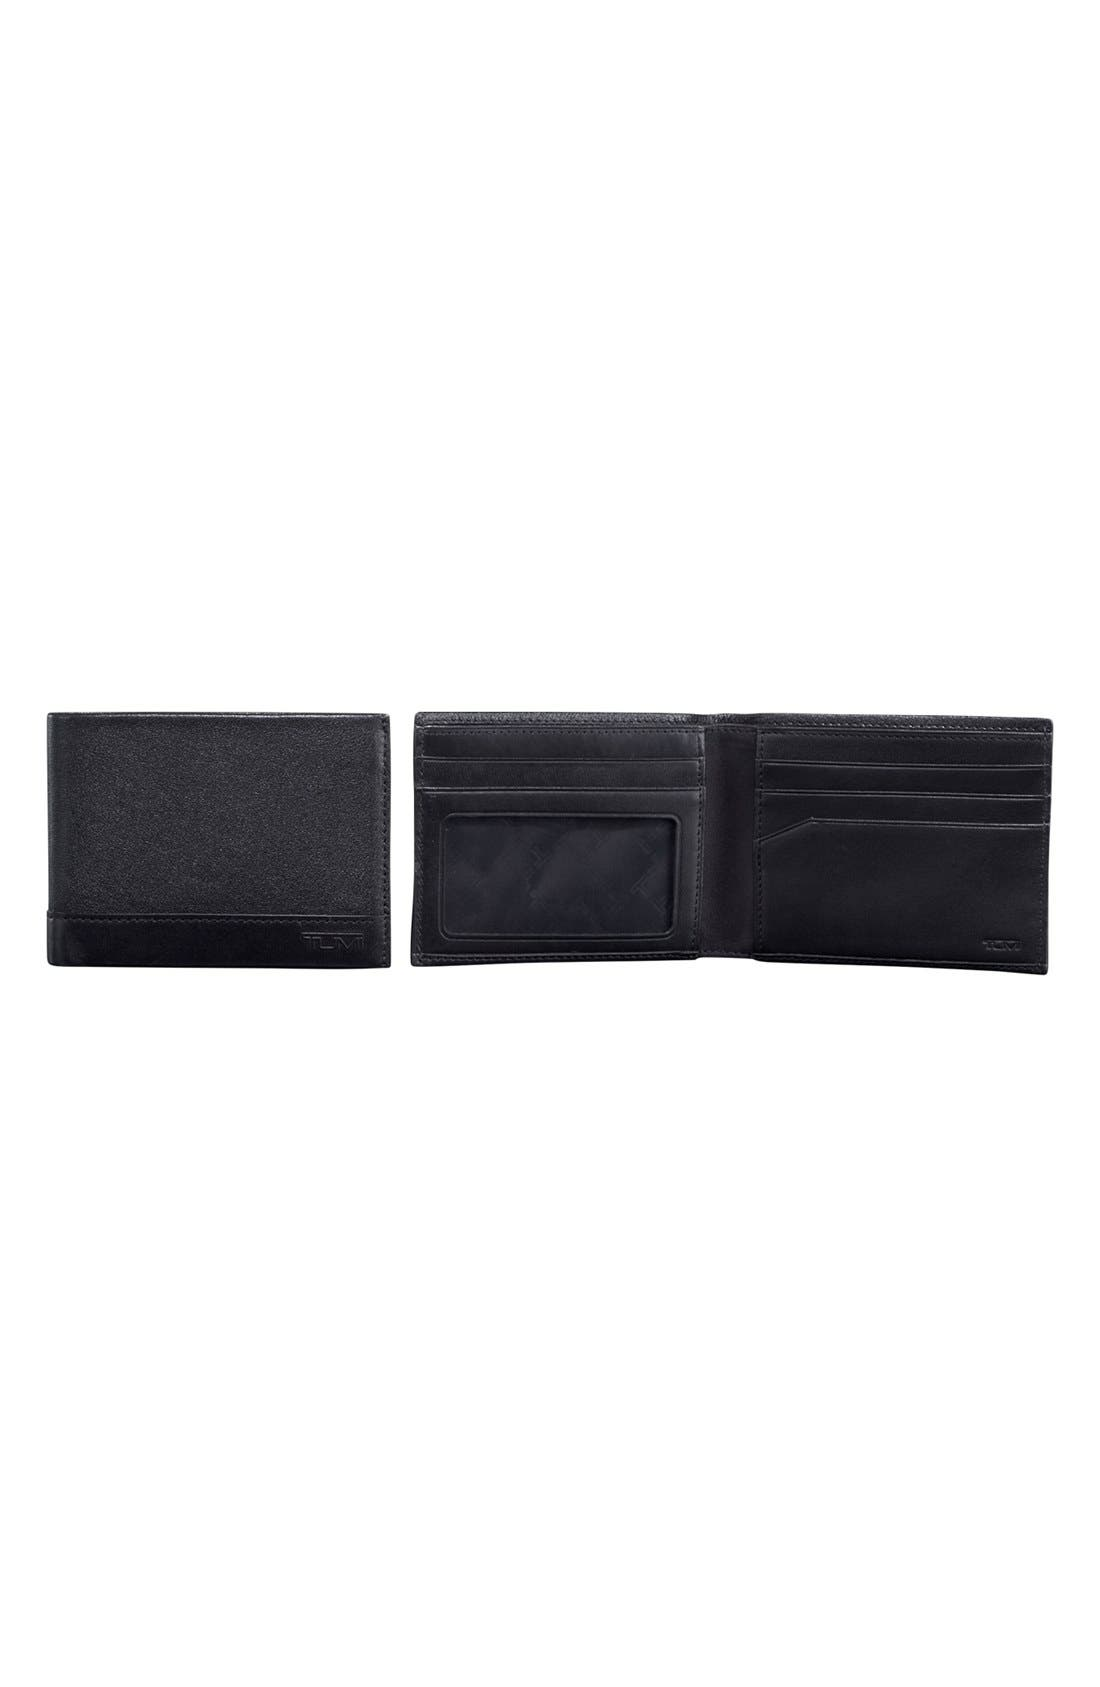 Main Image - Tumi 'Rivington' Leather Wallet